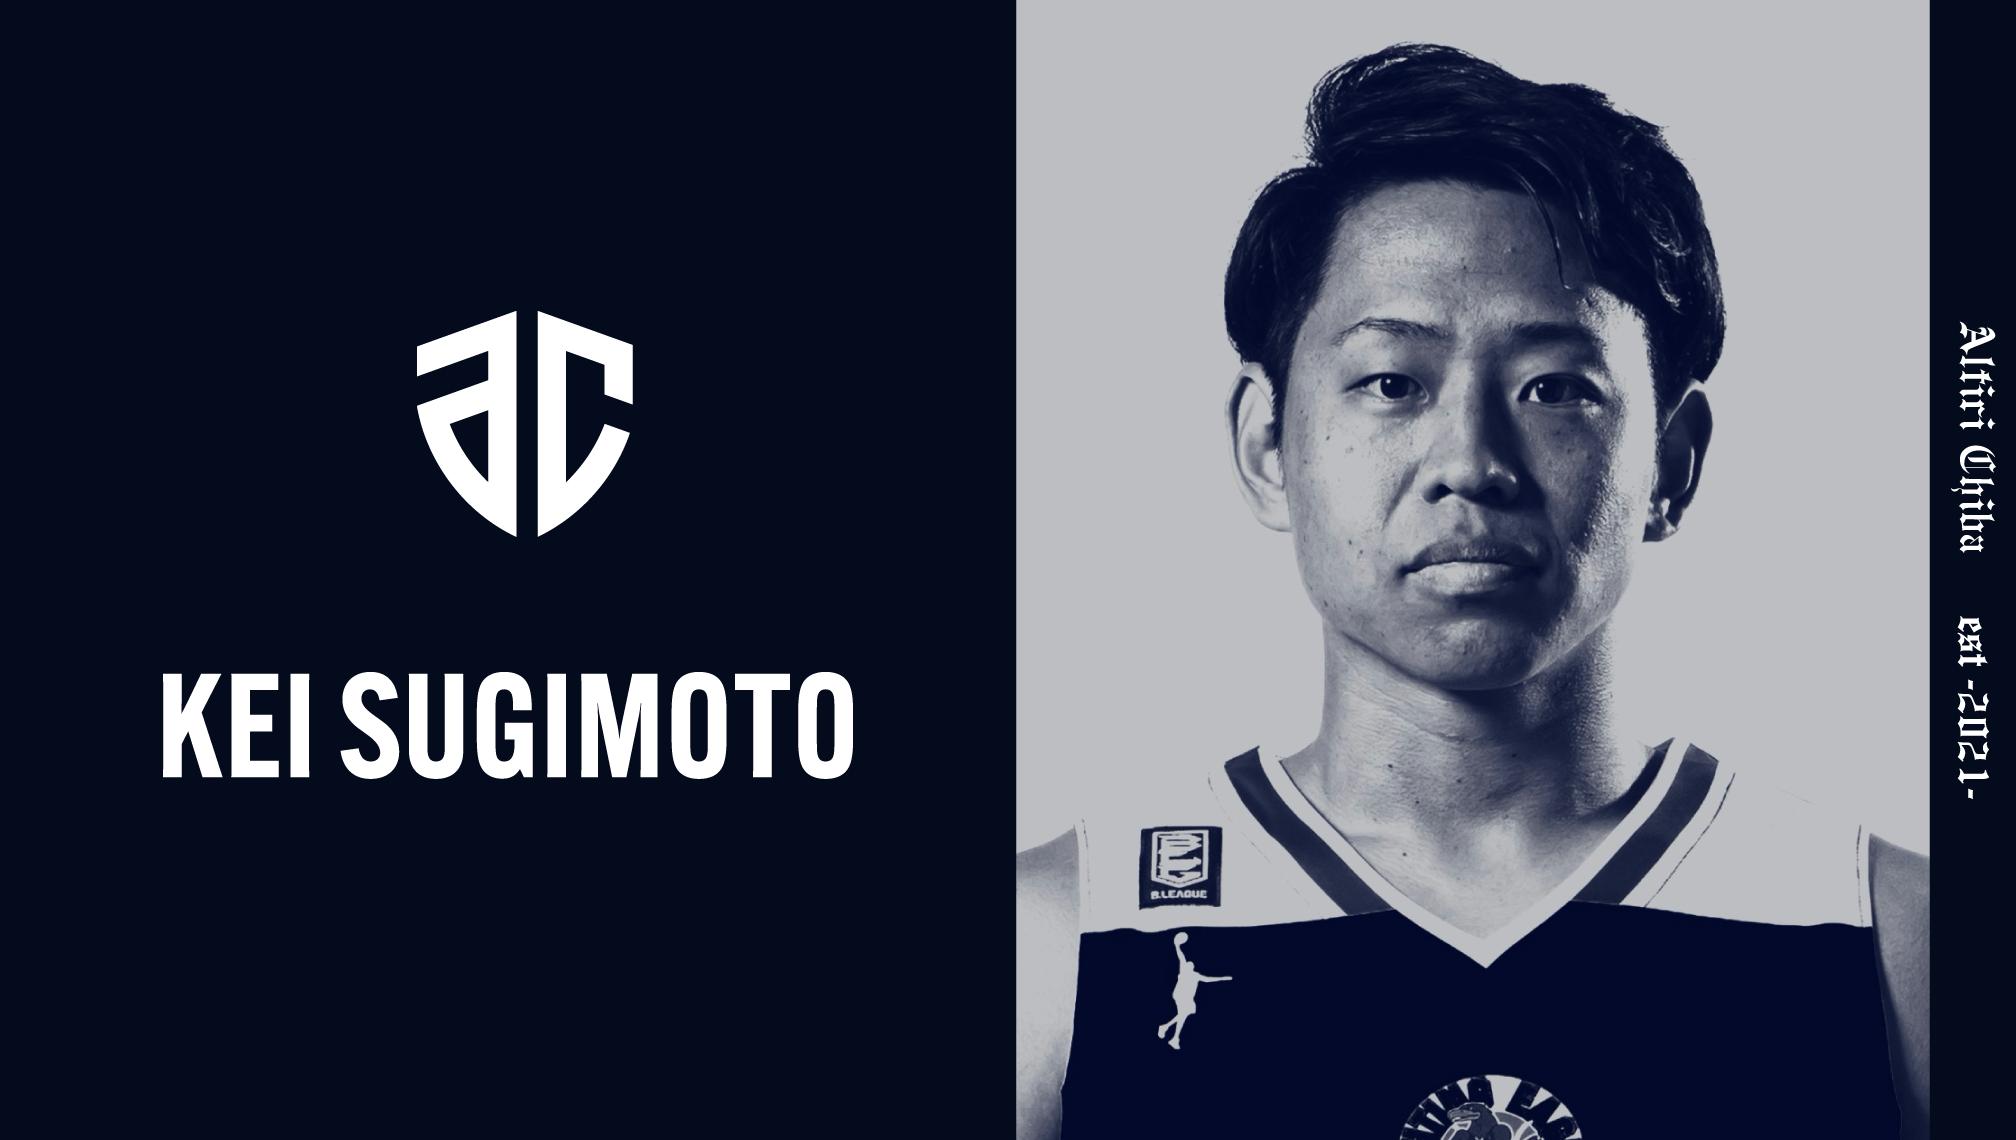 【ALTIRI CHIBA】杉本 慶選手 契約締結のお知らせ